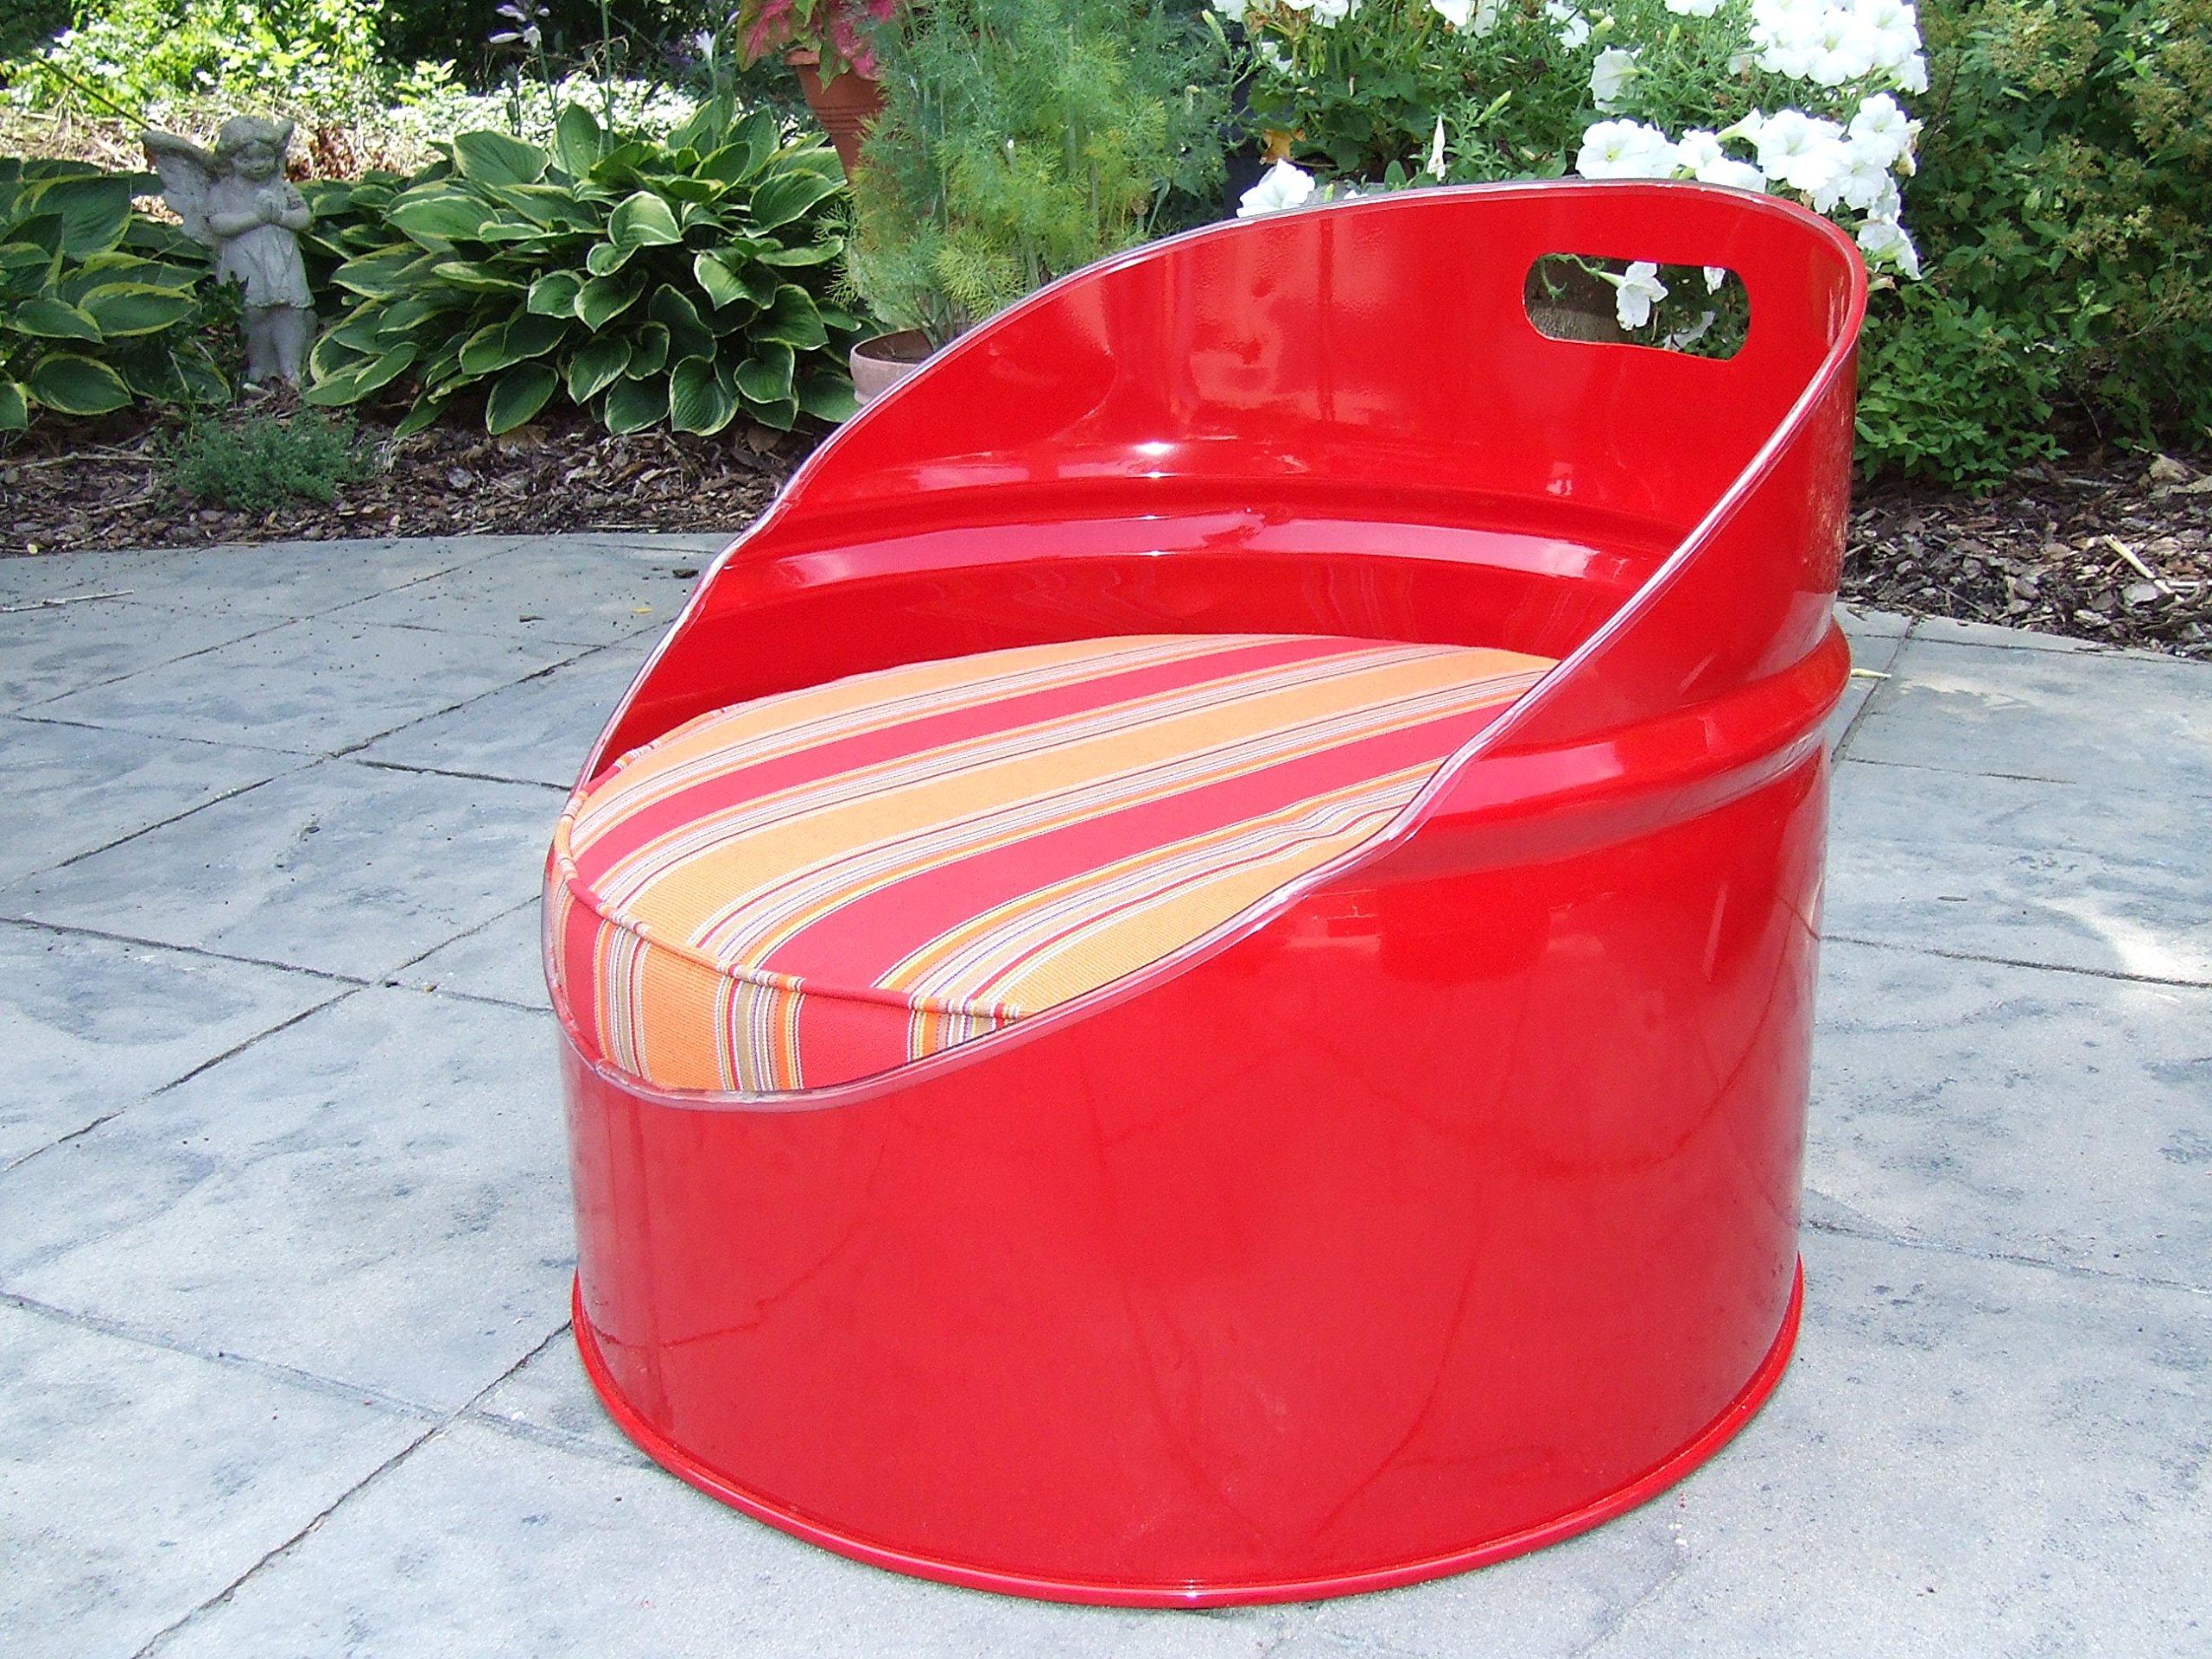 Drum Works Furniture 7010 Bravada Salsa on Red Kids Chair/Gaming Chair